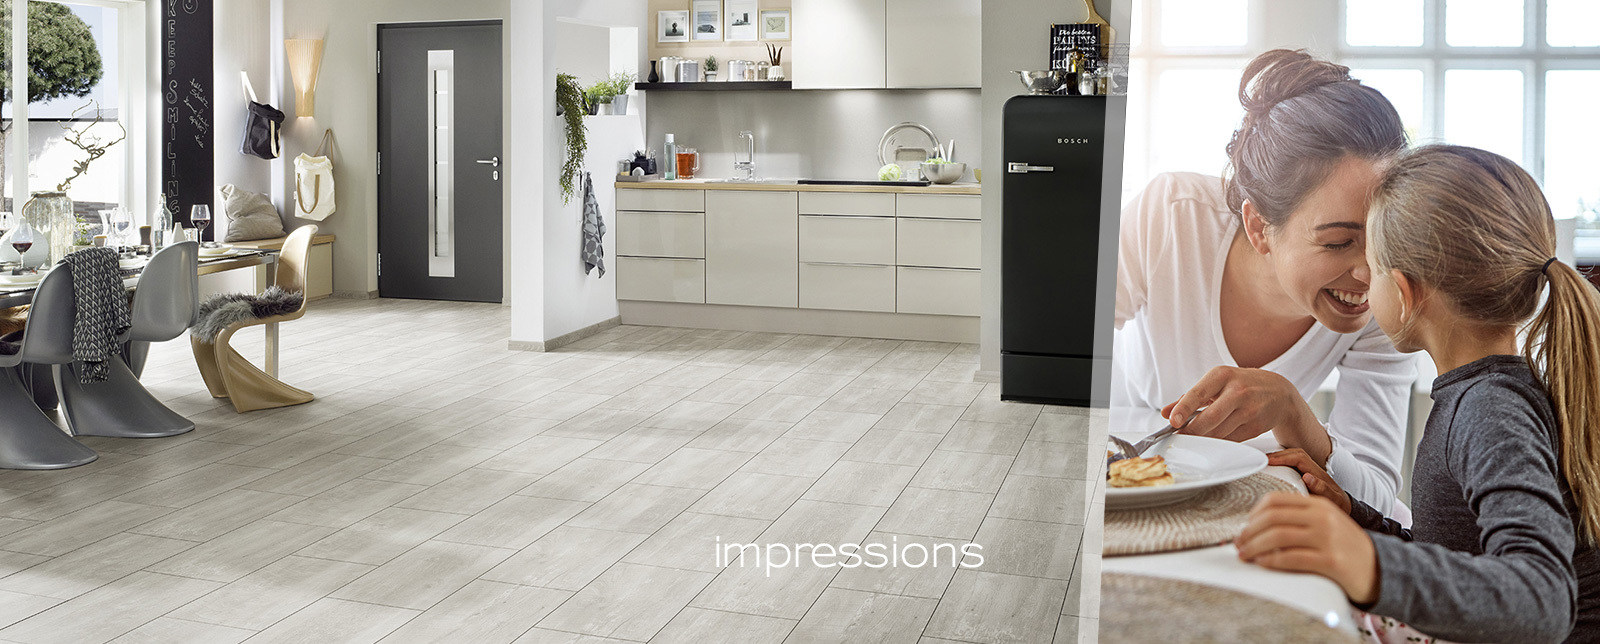 Laminate flooring impressions the ceramic tile look krono original dailygadgetfo Choice Image